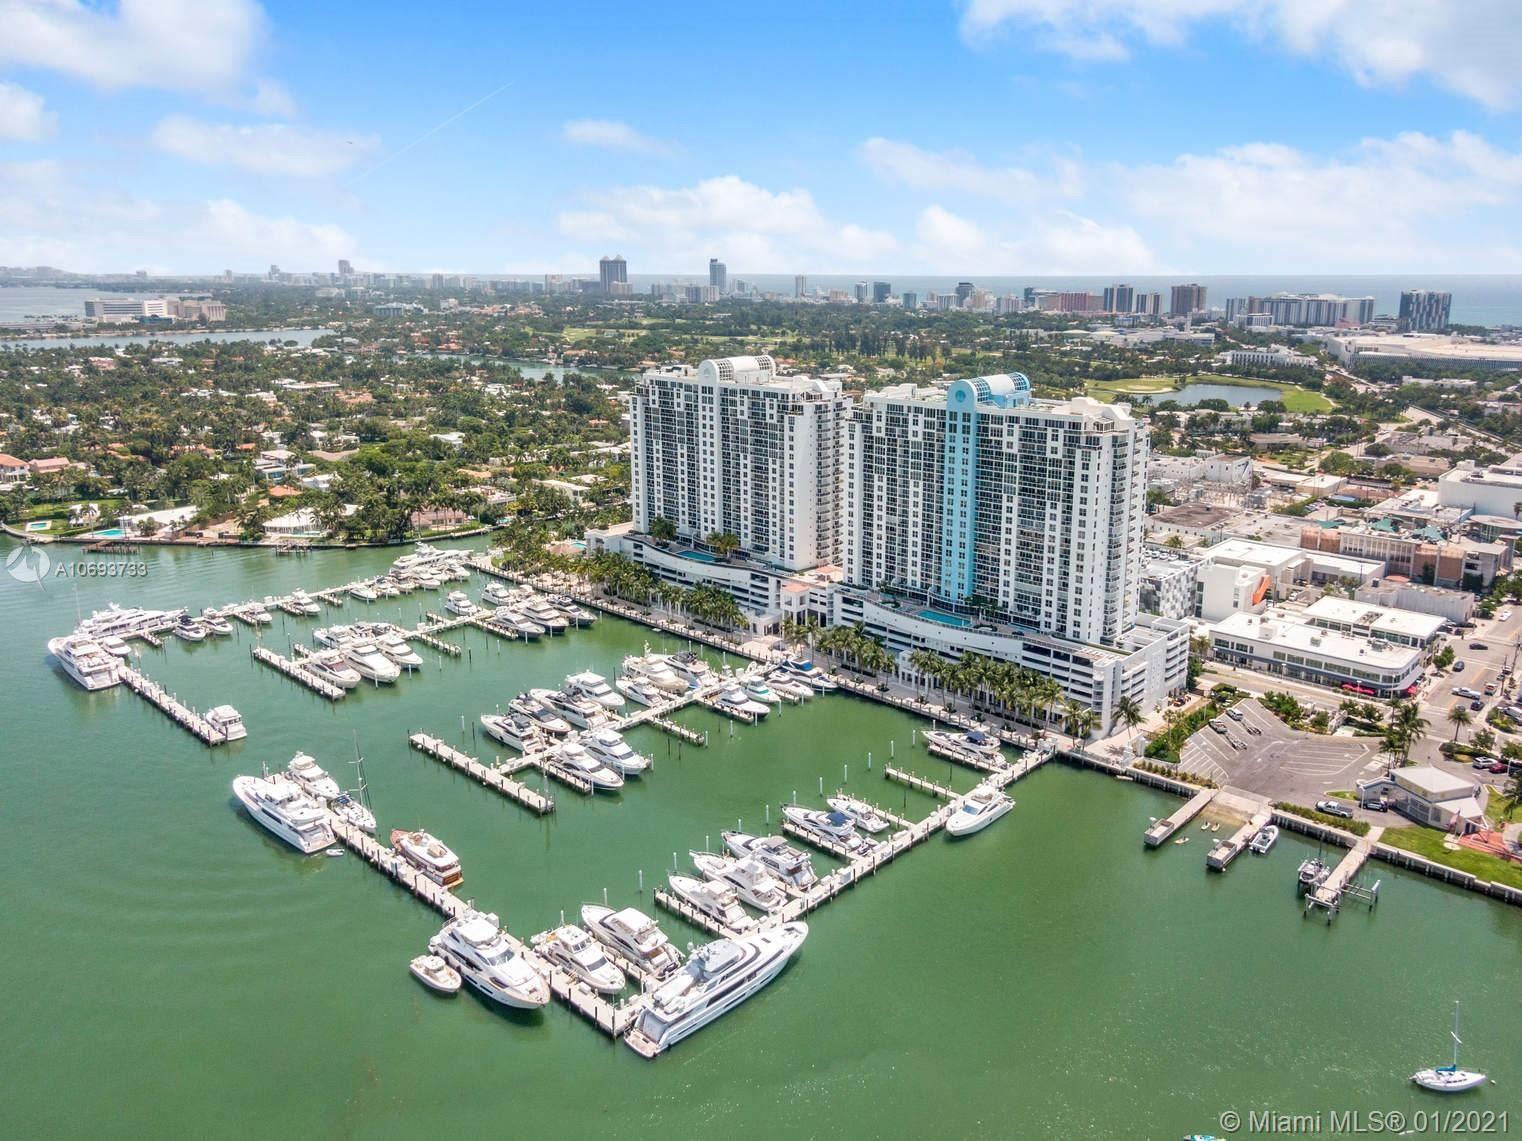 1800 Sunset Harbour Dr #1501, Miami Beach, FL 33139 - #: A10693733